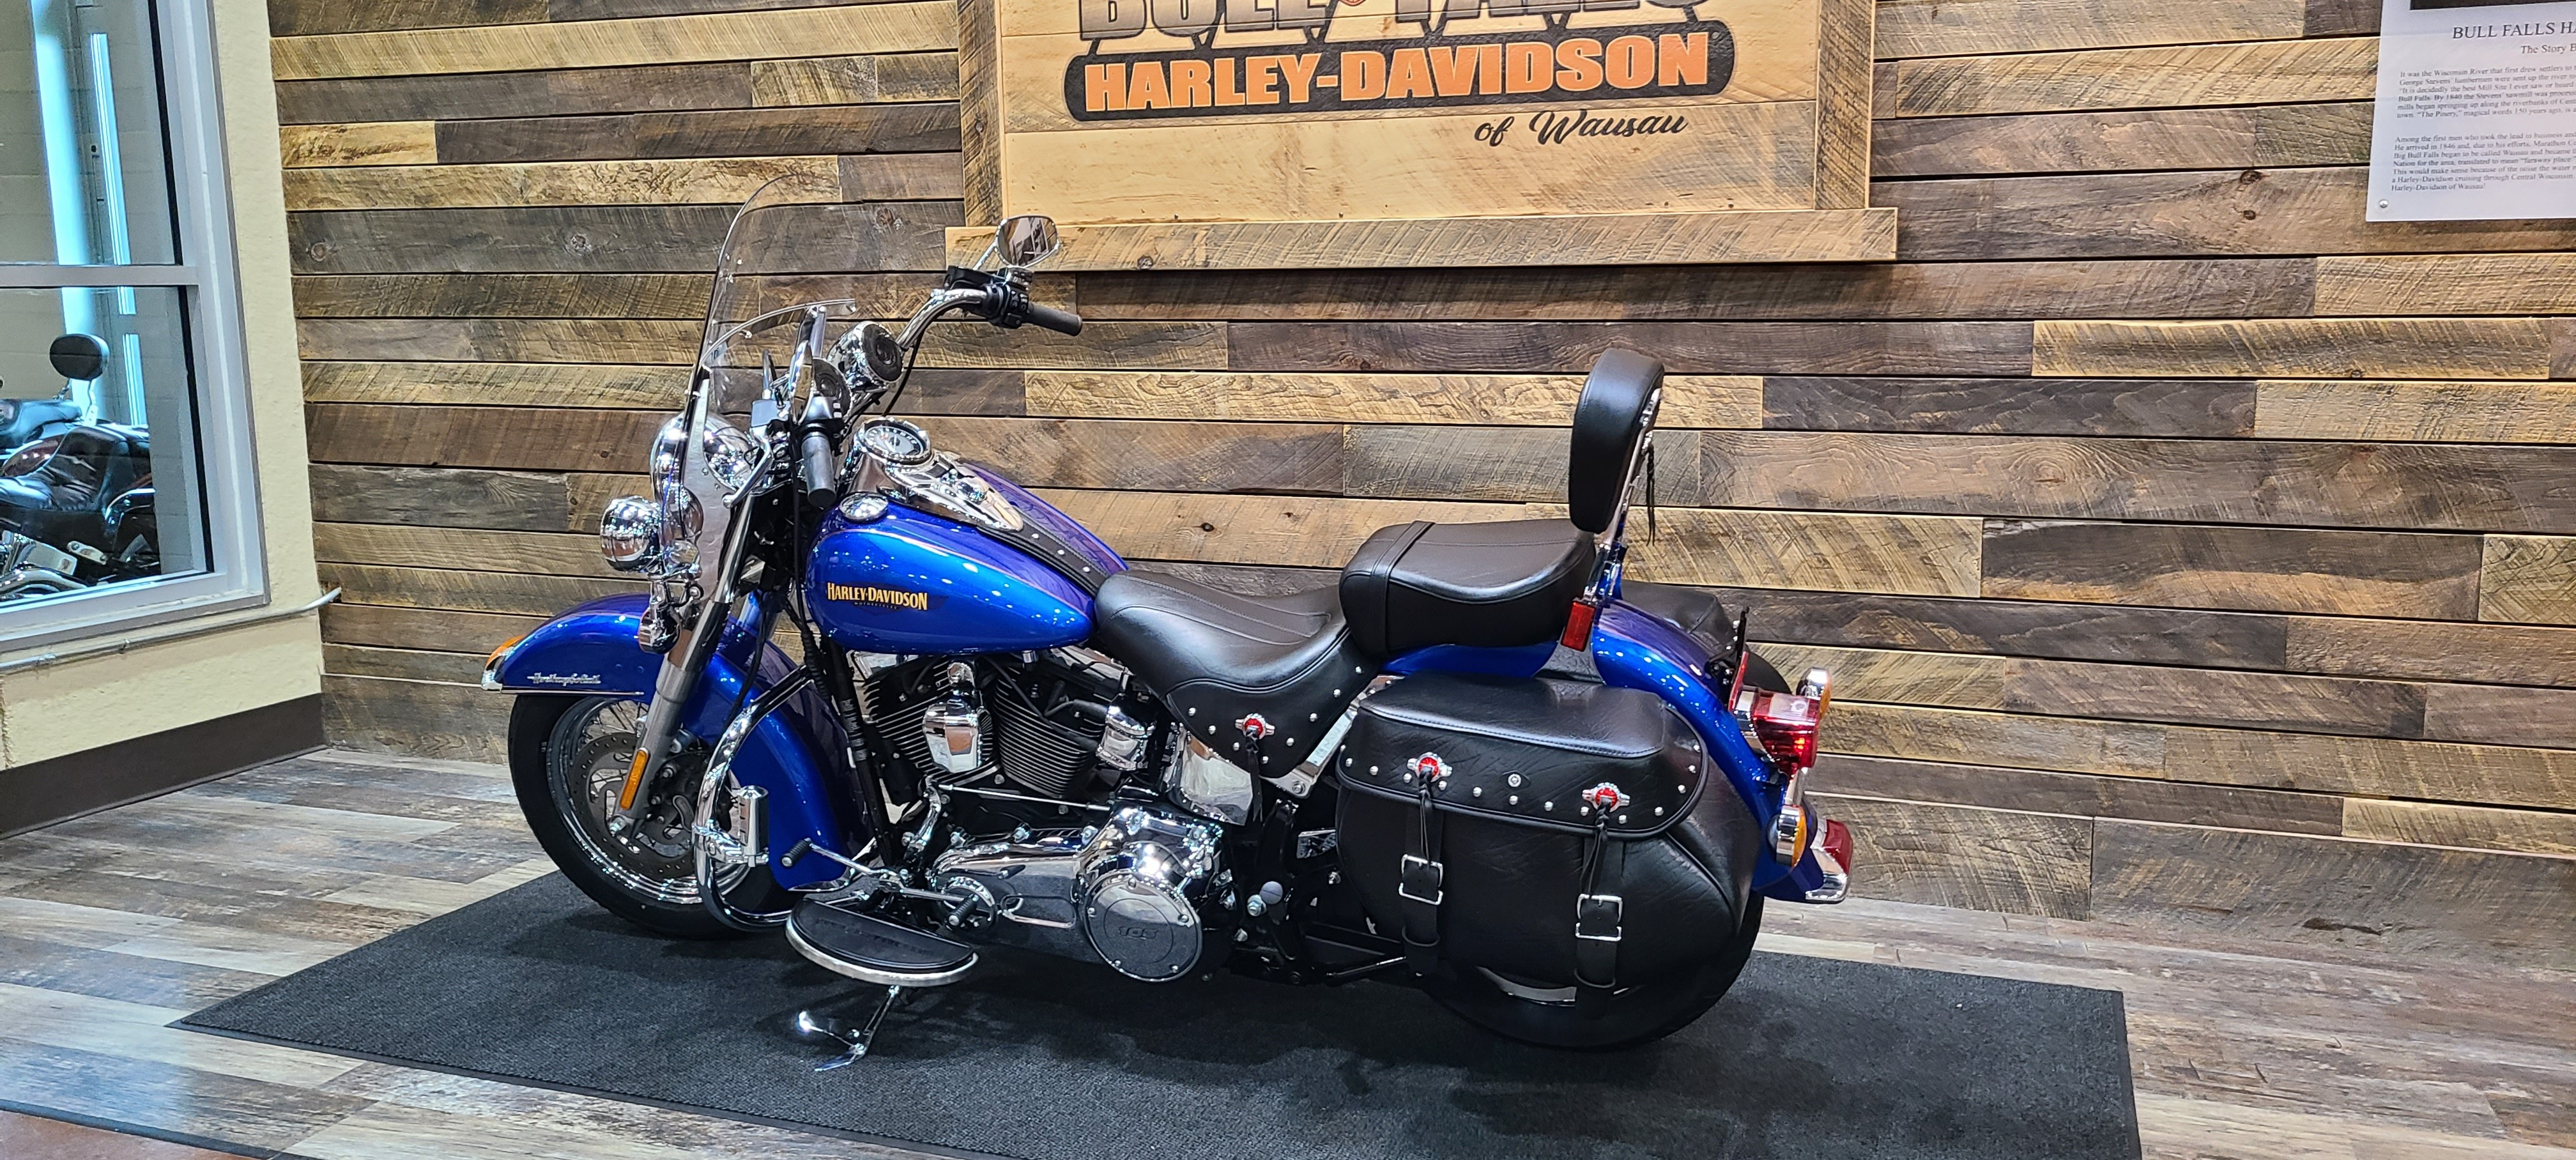 2017 Harley-Davidson Softail Heritage Softail Classic at Bull Falls Harley-Davidson